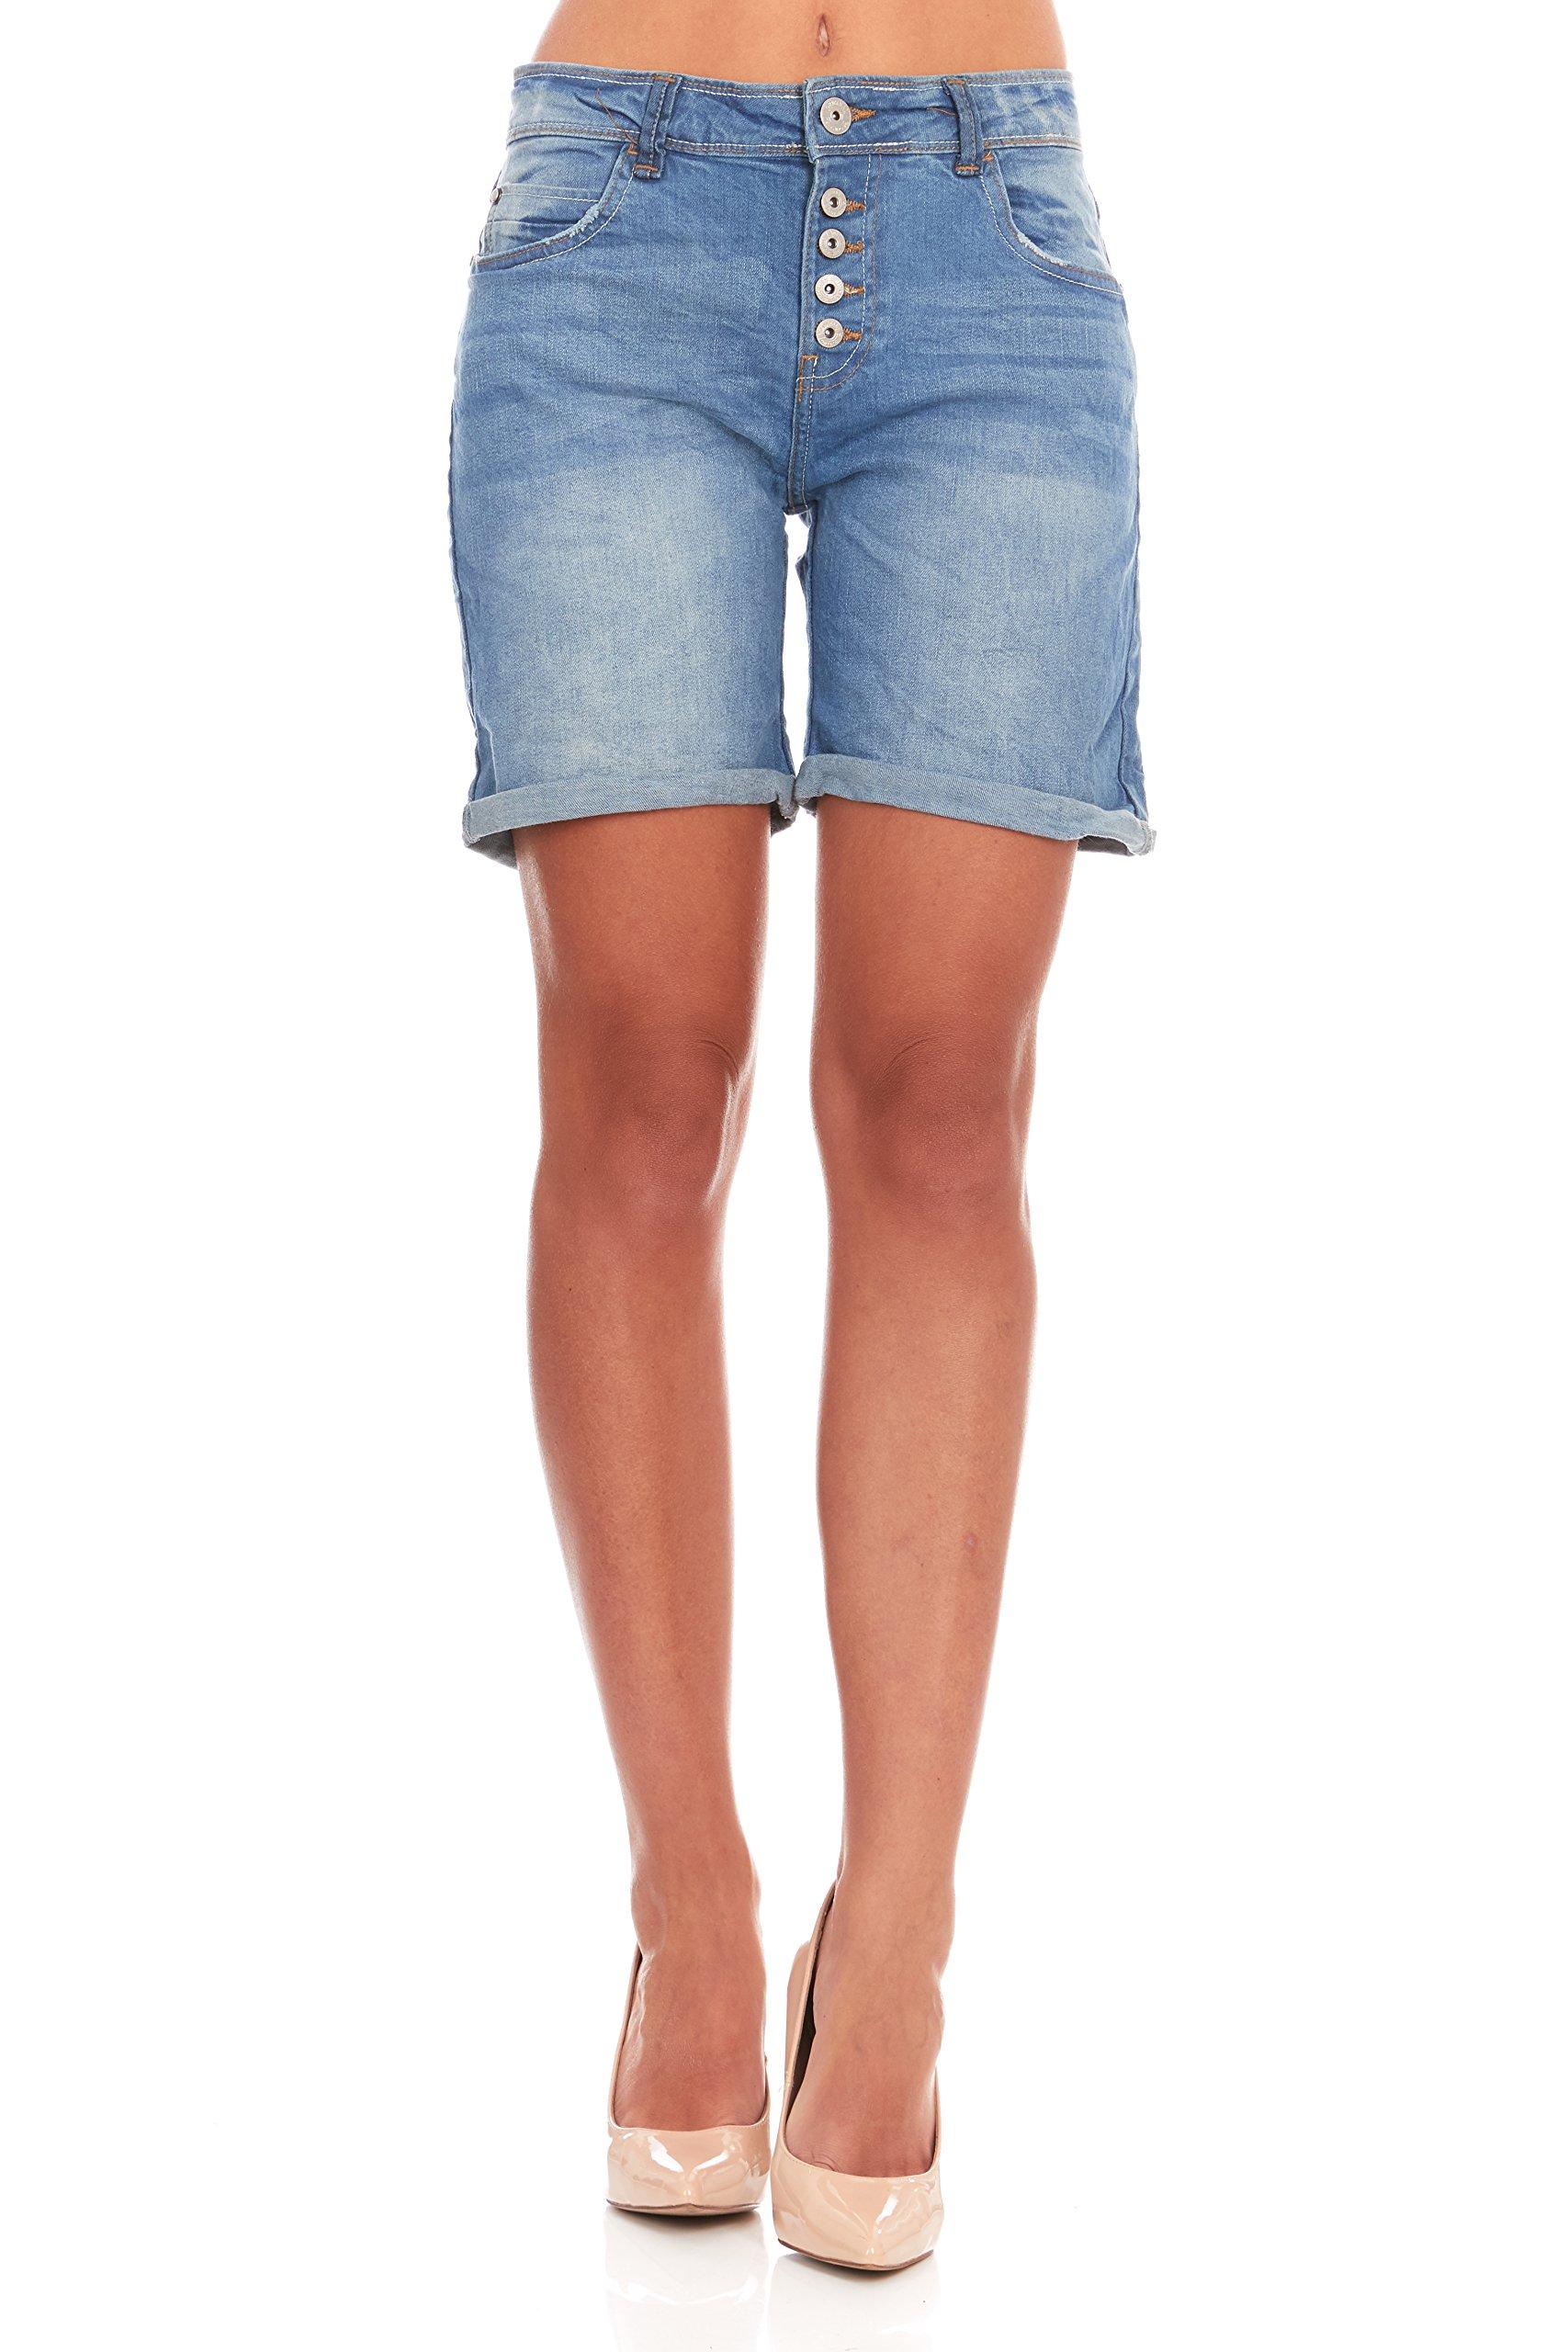 Nextex Apparel Group Women's Casual Stretchy Mid Waist Blue Denim Bermuda Jean Shorts (Medium)